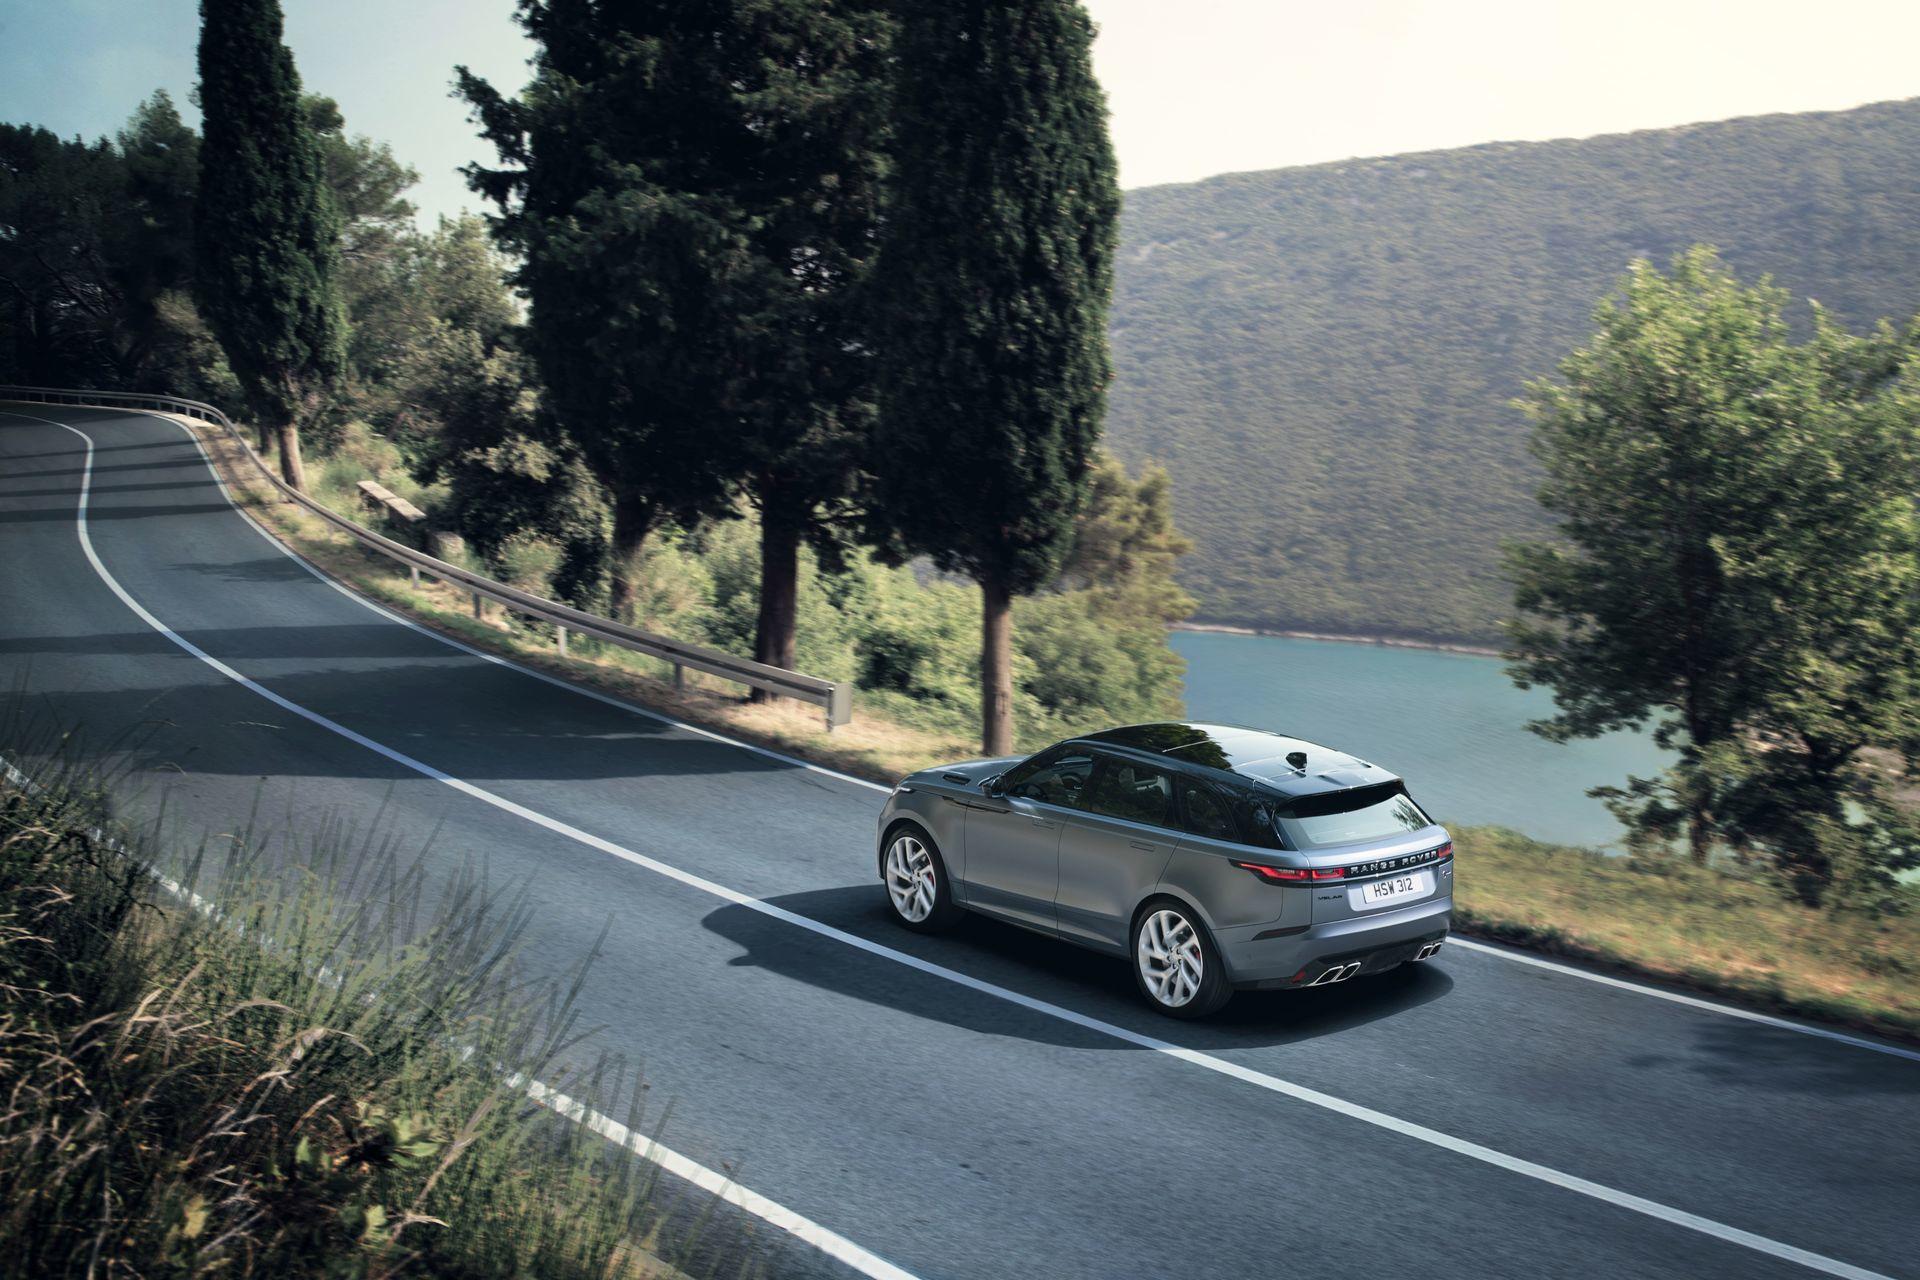 Range Rover Velar Svautobiography 21